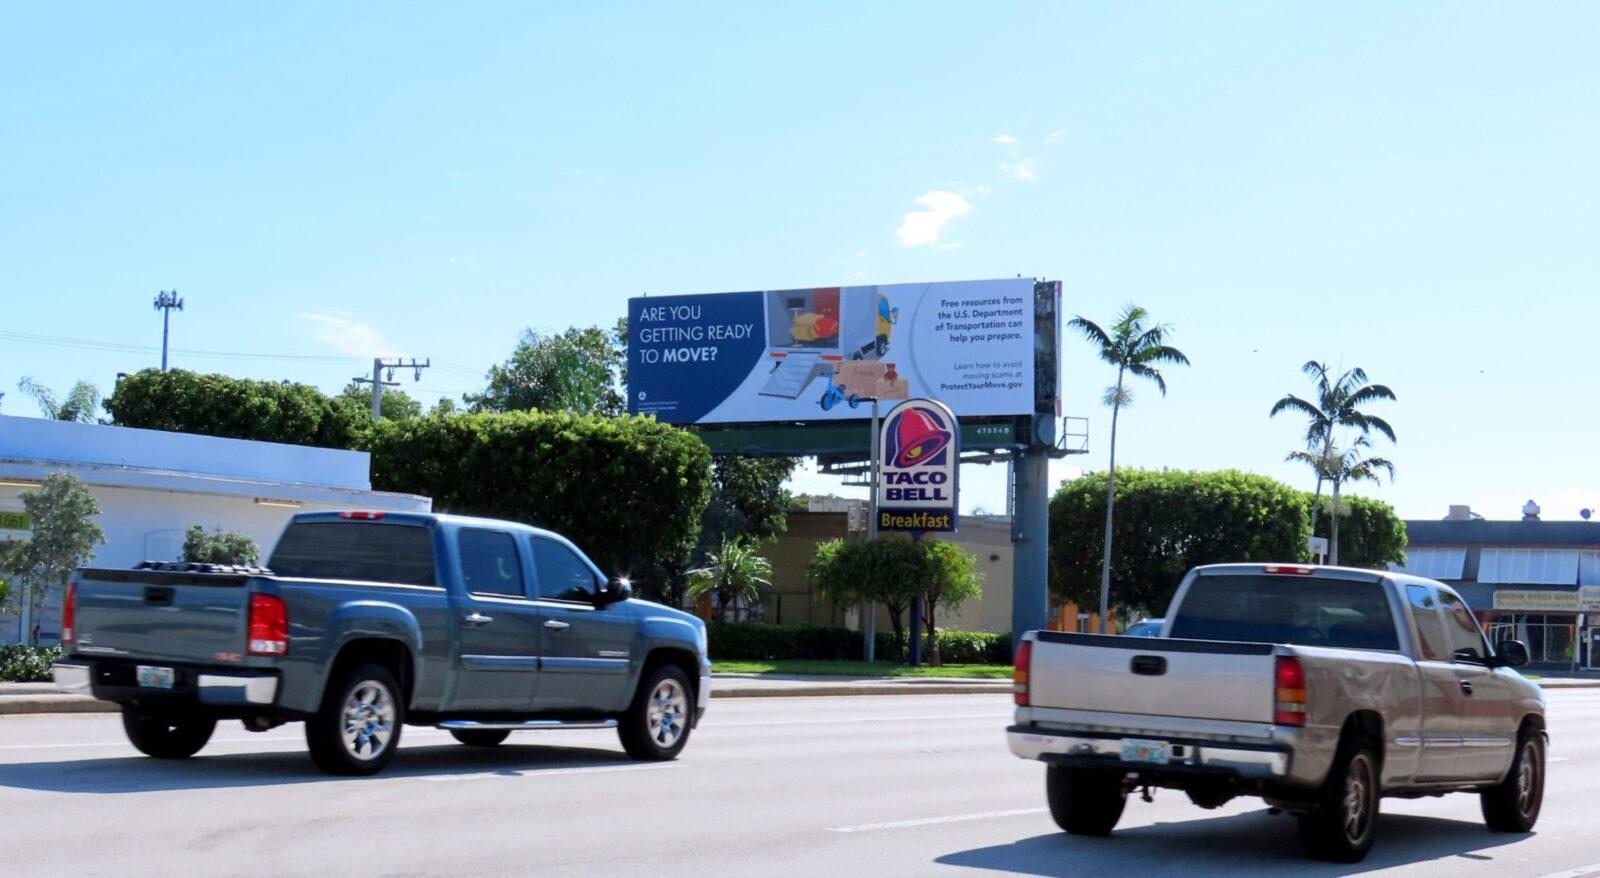 Pompano Beach Florida Billboard Advertising FMCSA